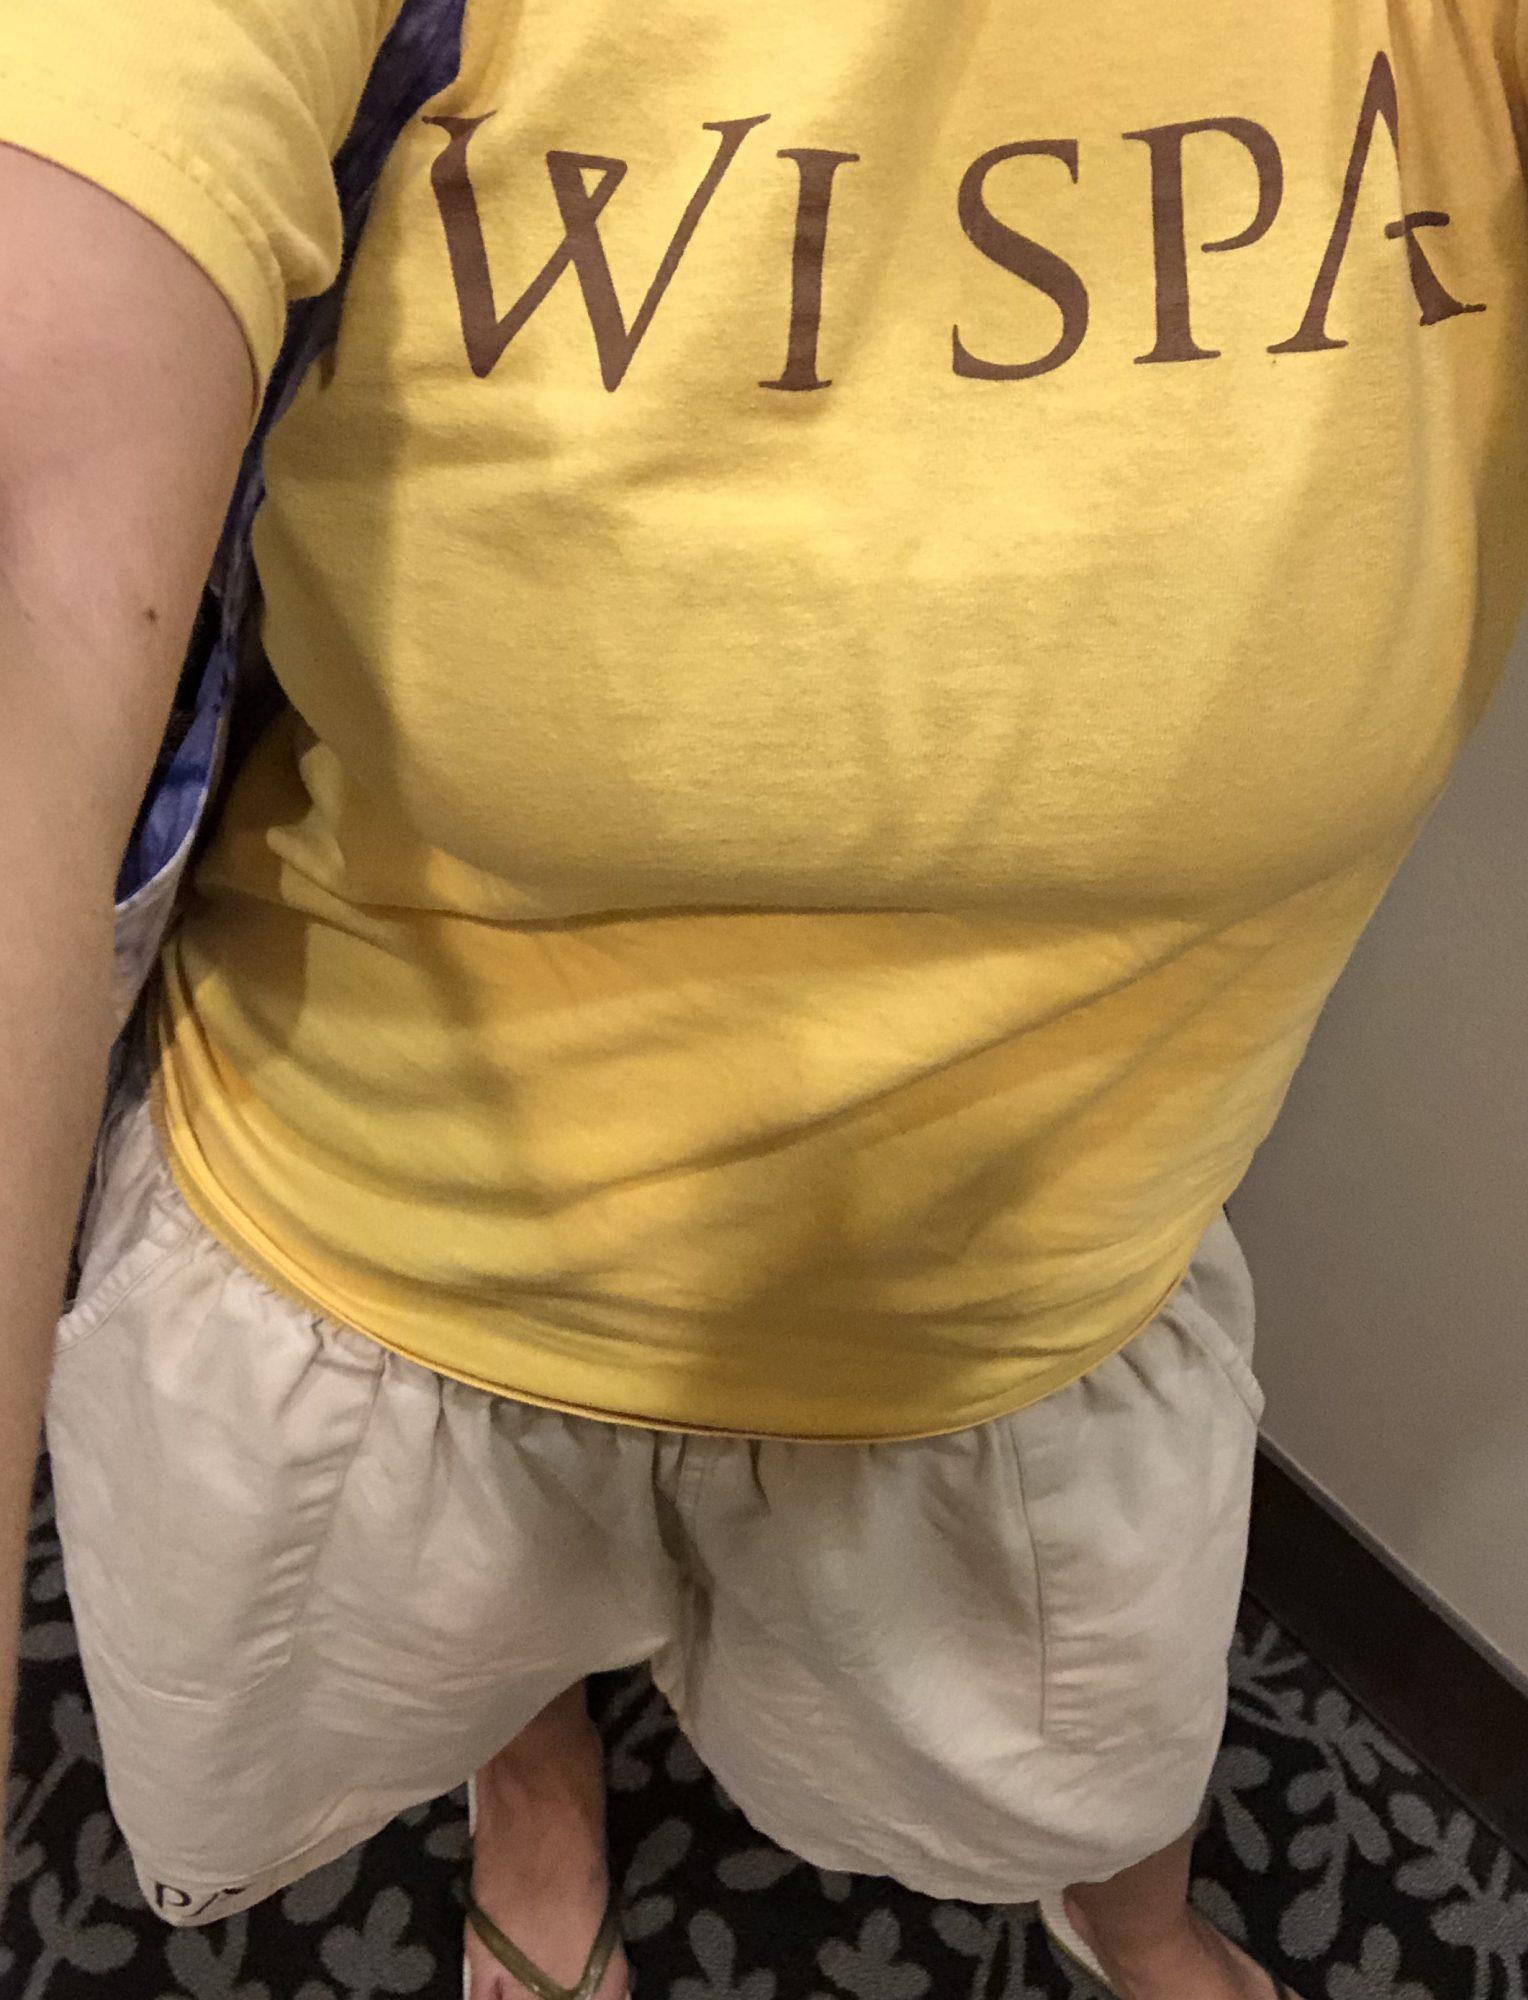 korean-spa-review-outfit.jpg